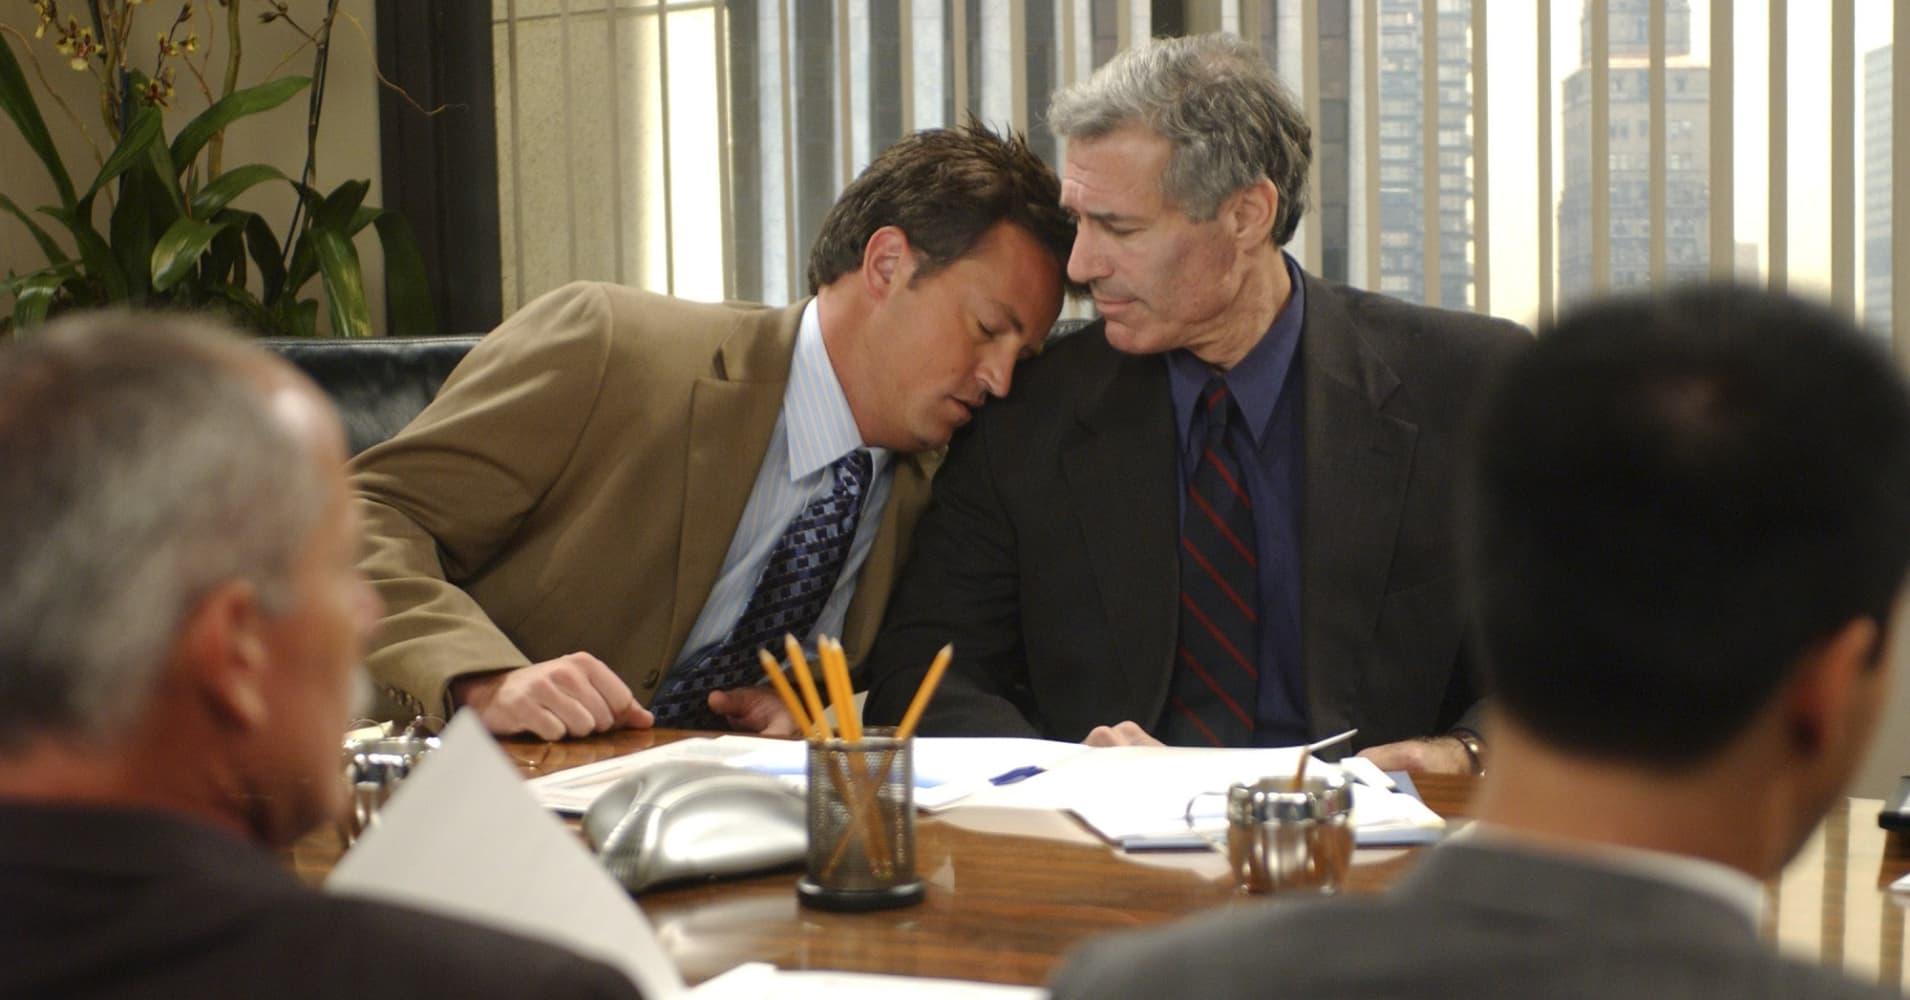 In an episode of Friends, Chandler Bing falls asleep on his coworker